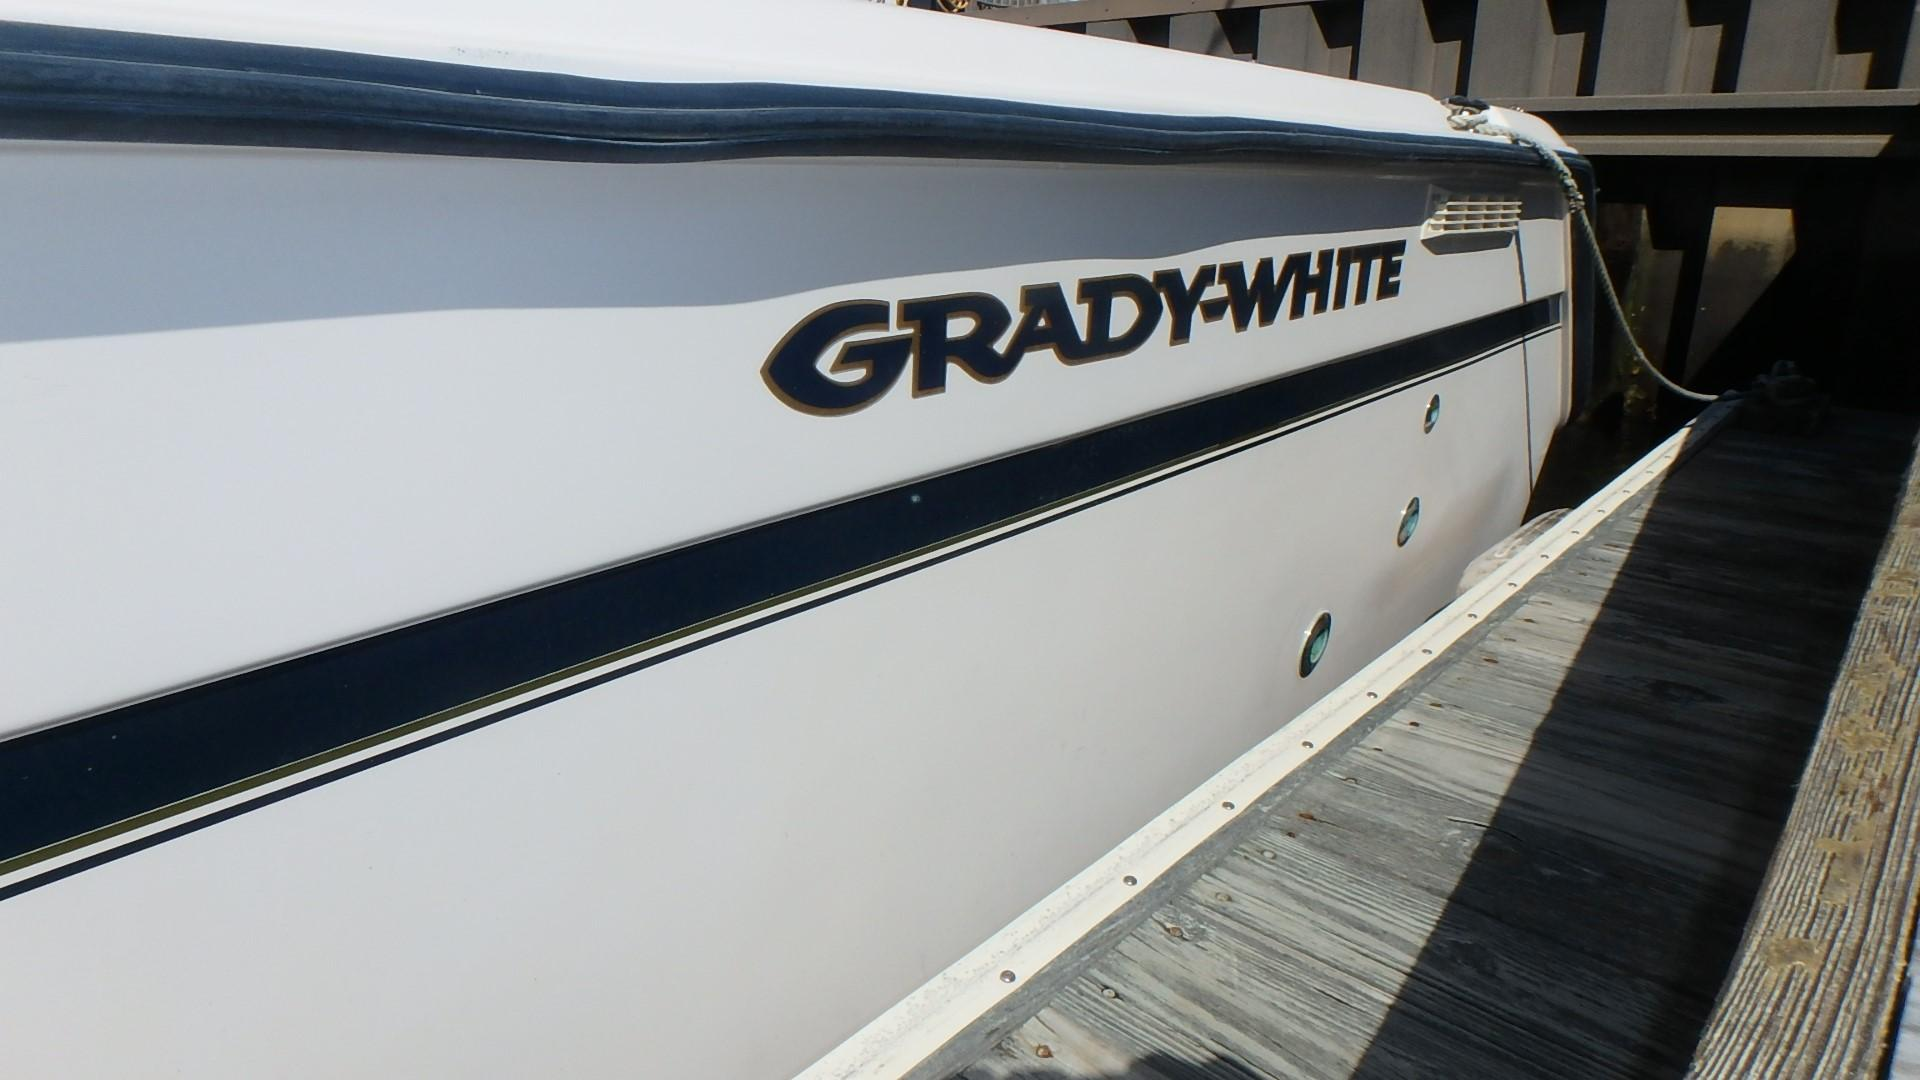 Grady-white 300 Marlin WA - Photo: #62